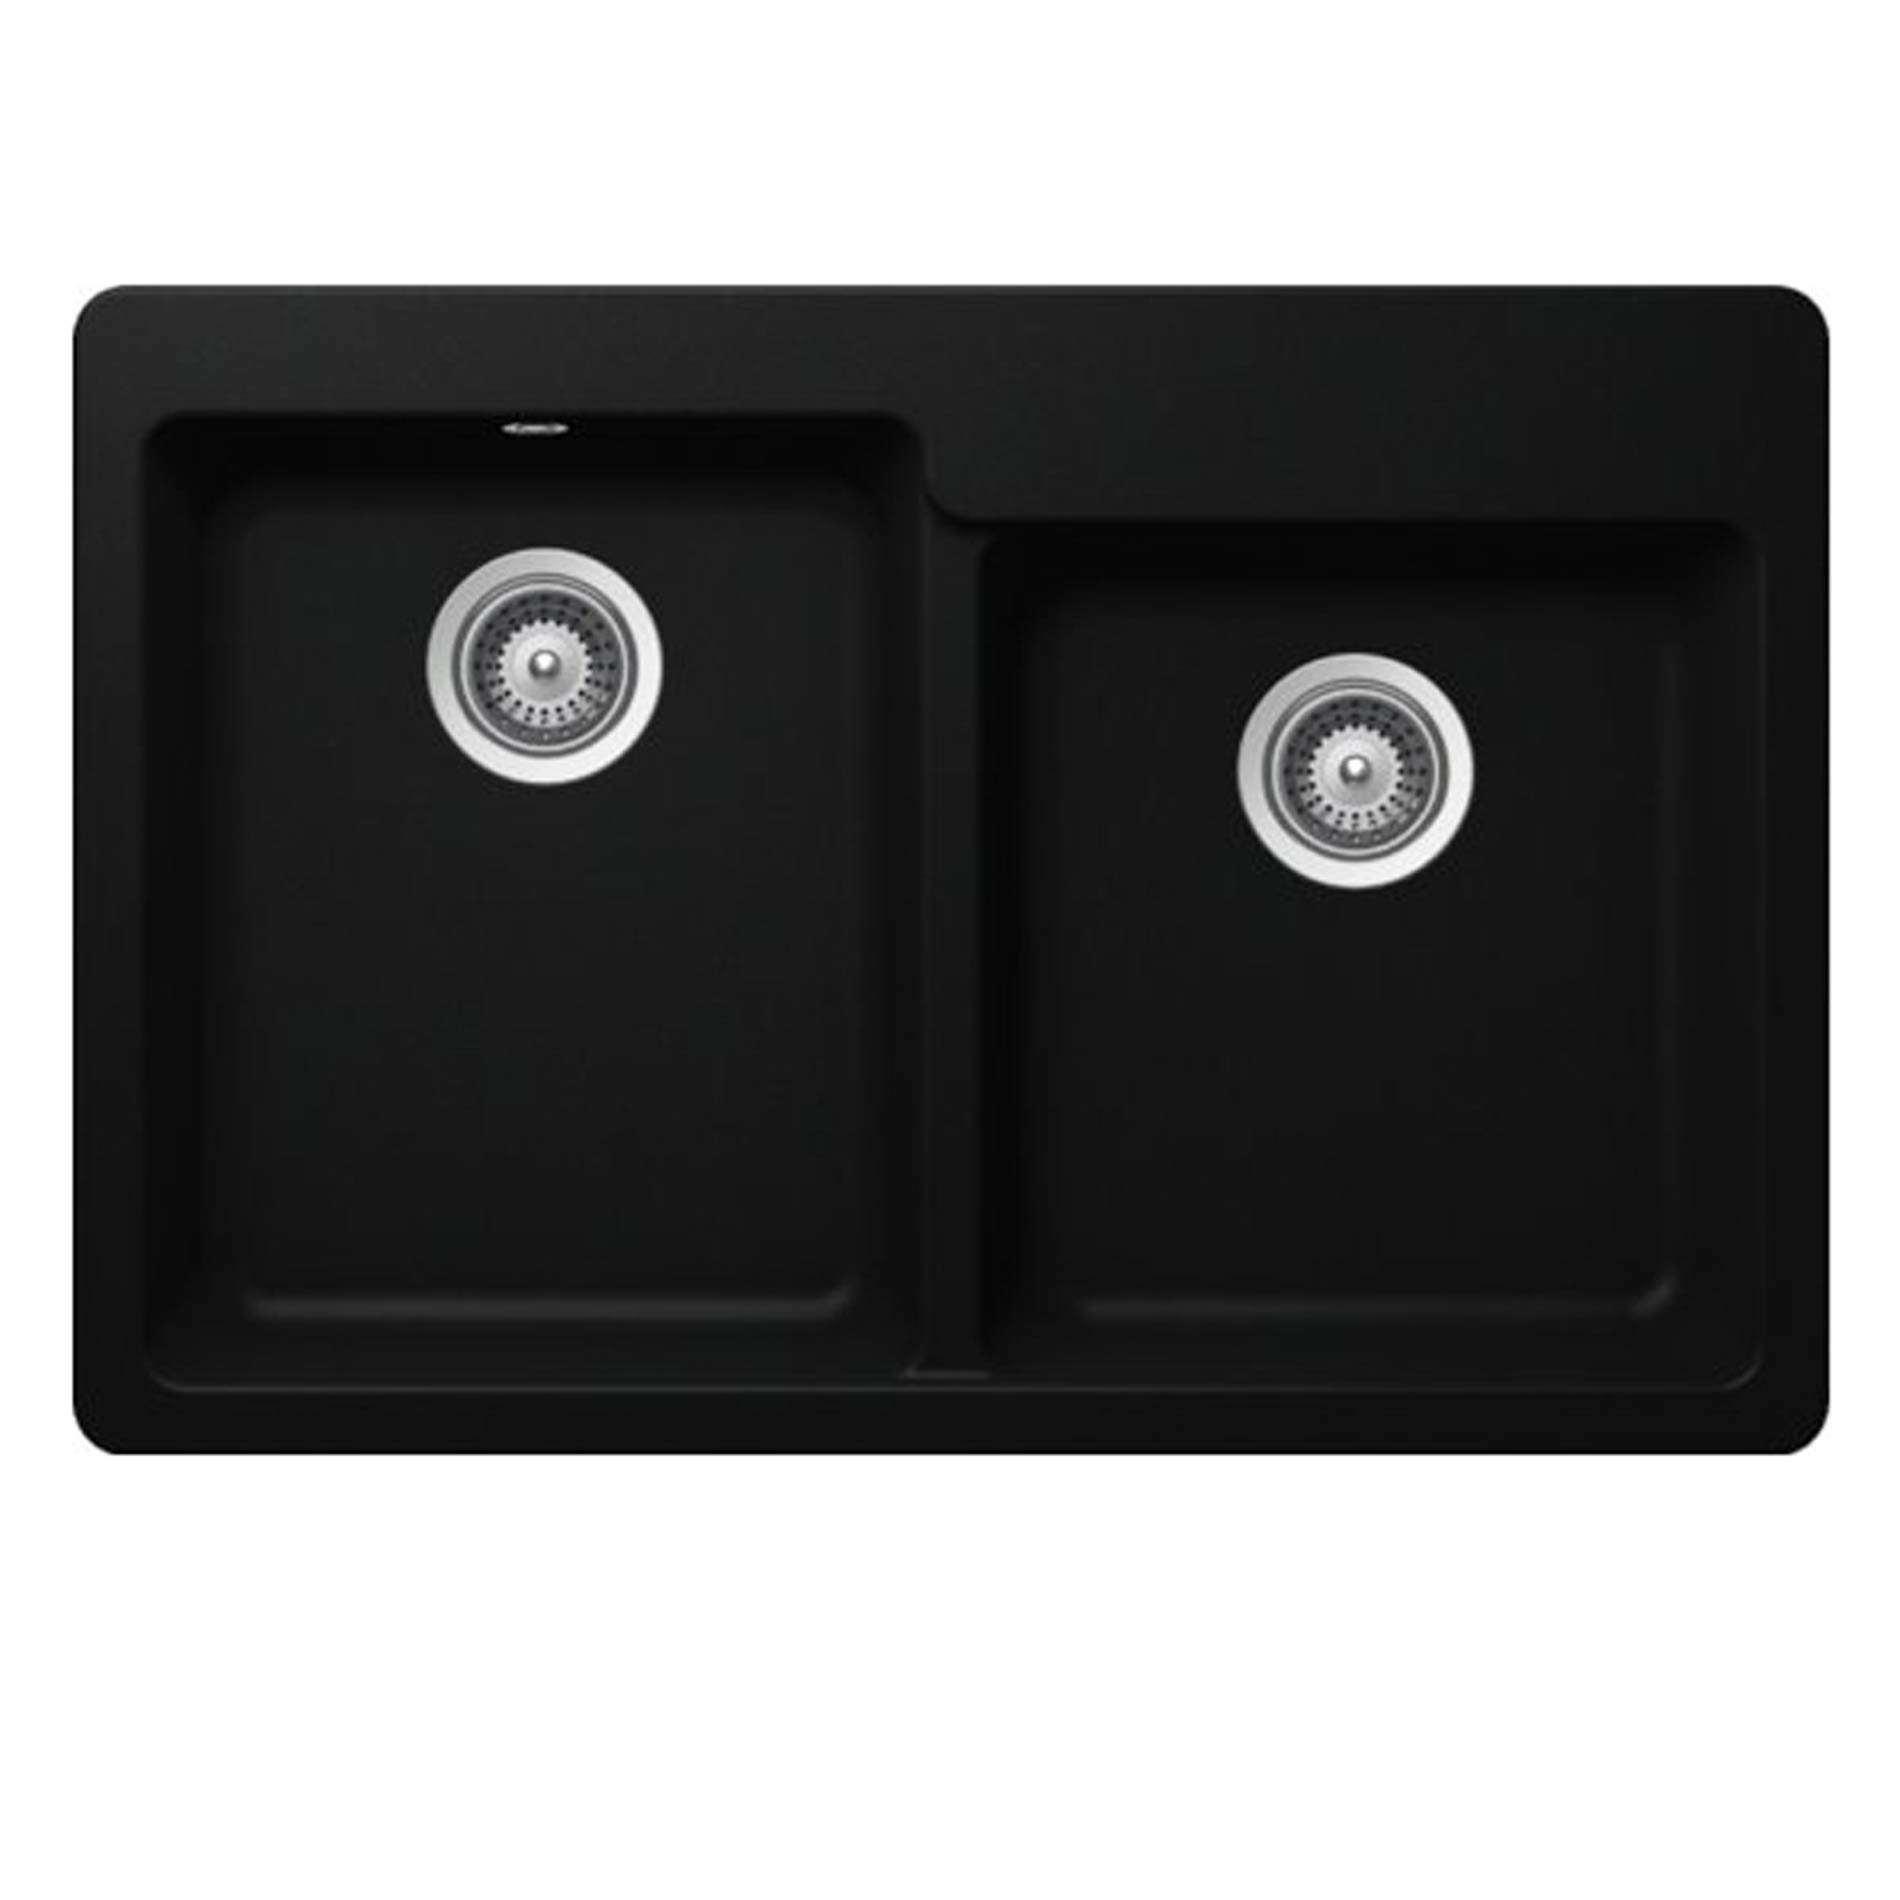 Acrylic Kitchen Sink Manufacturers